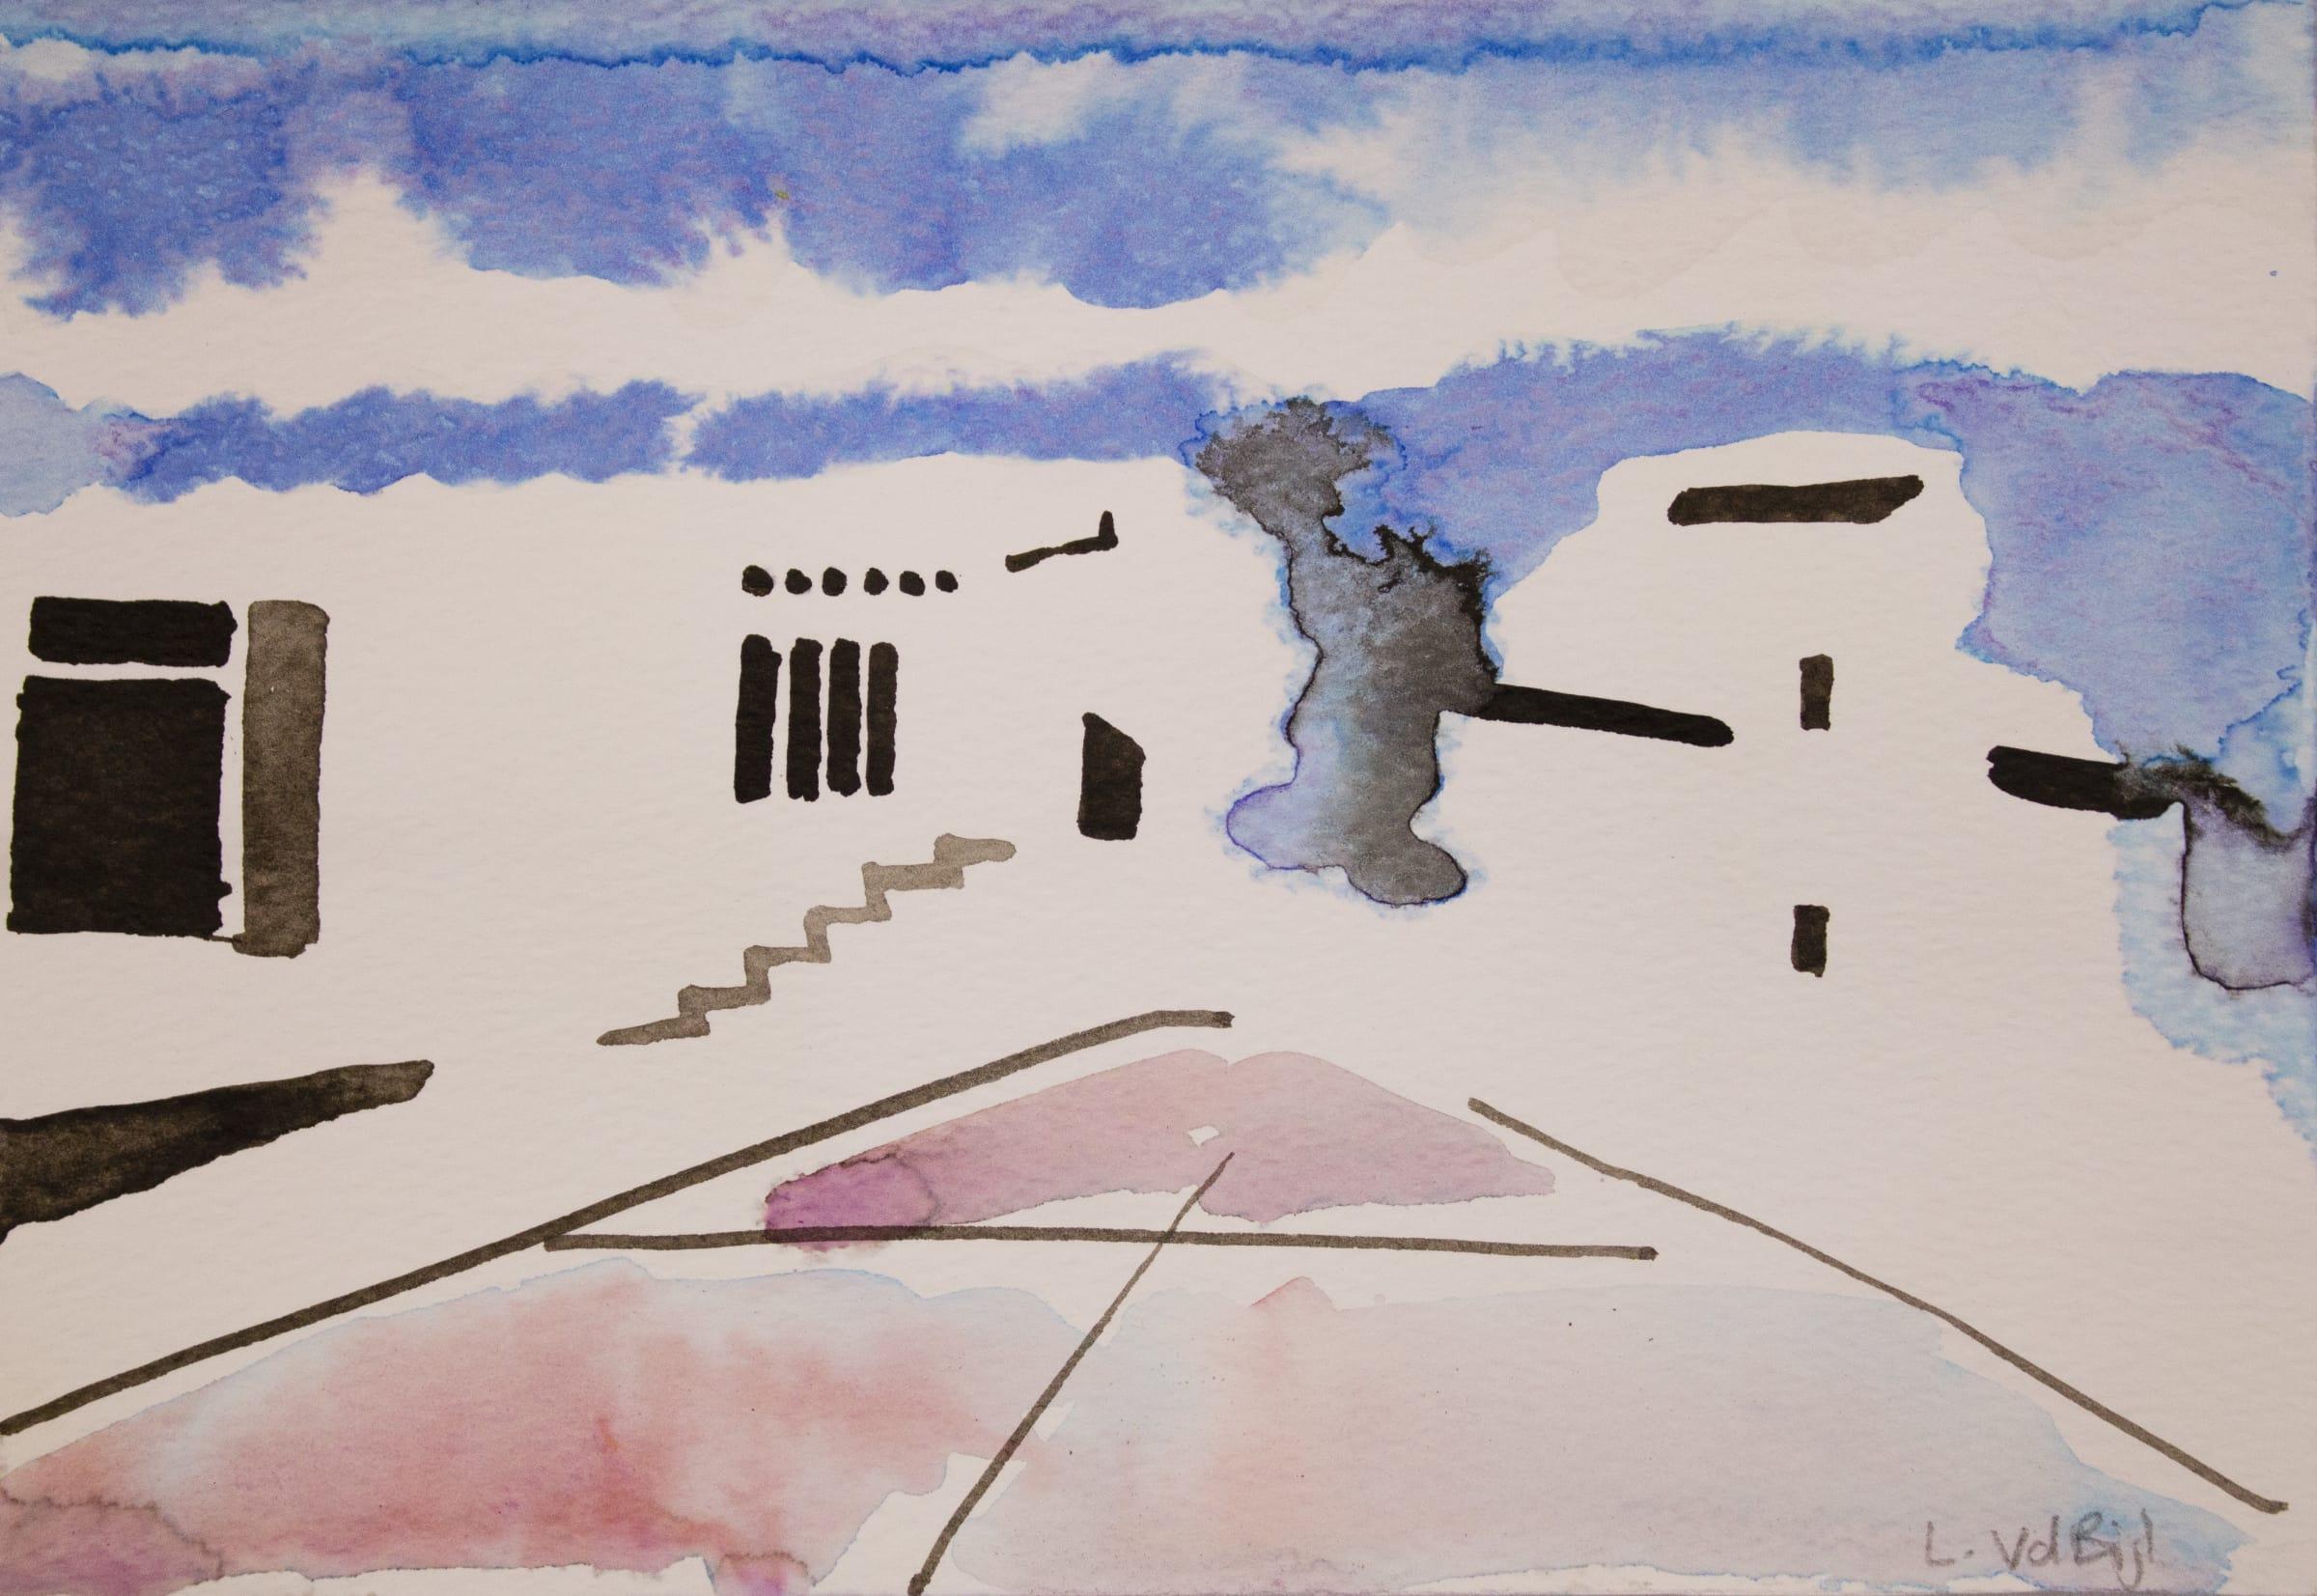 <span class=&#34;link fancybox-details-link&#34;><a href=&#34;/artists/88-louise-van-der-bijl/works/2277-louise-van-der-bijl-inktober-day-15-2018/&#34;>View Detail Page</a></span><div class=&#34;artist&#34;><strong>Louise Van Der Bijl</strong></div> <div class=&#34;title&#34;><em>Inktober Day 15</em>, 2018</div> <div class=&#34;medium&#34;>Ink On Paper</div> <div class=&#34;dimensions&#34;>14.8cm x 21cm</div><div class=&#34;price&#34;>R400.00</div>